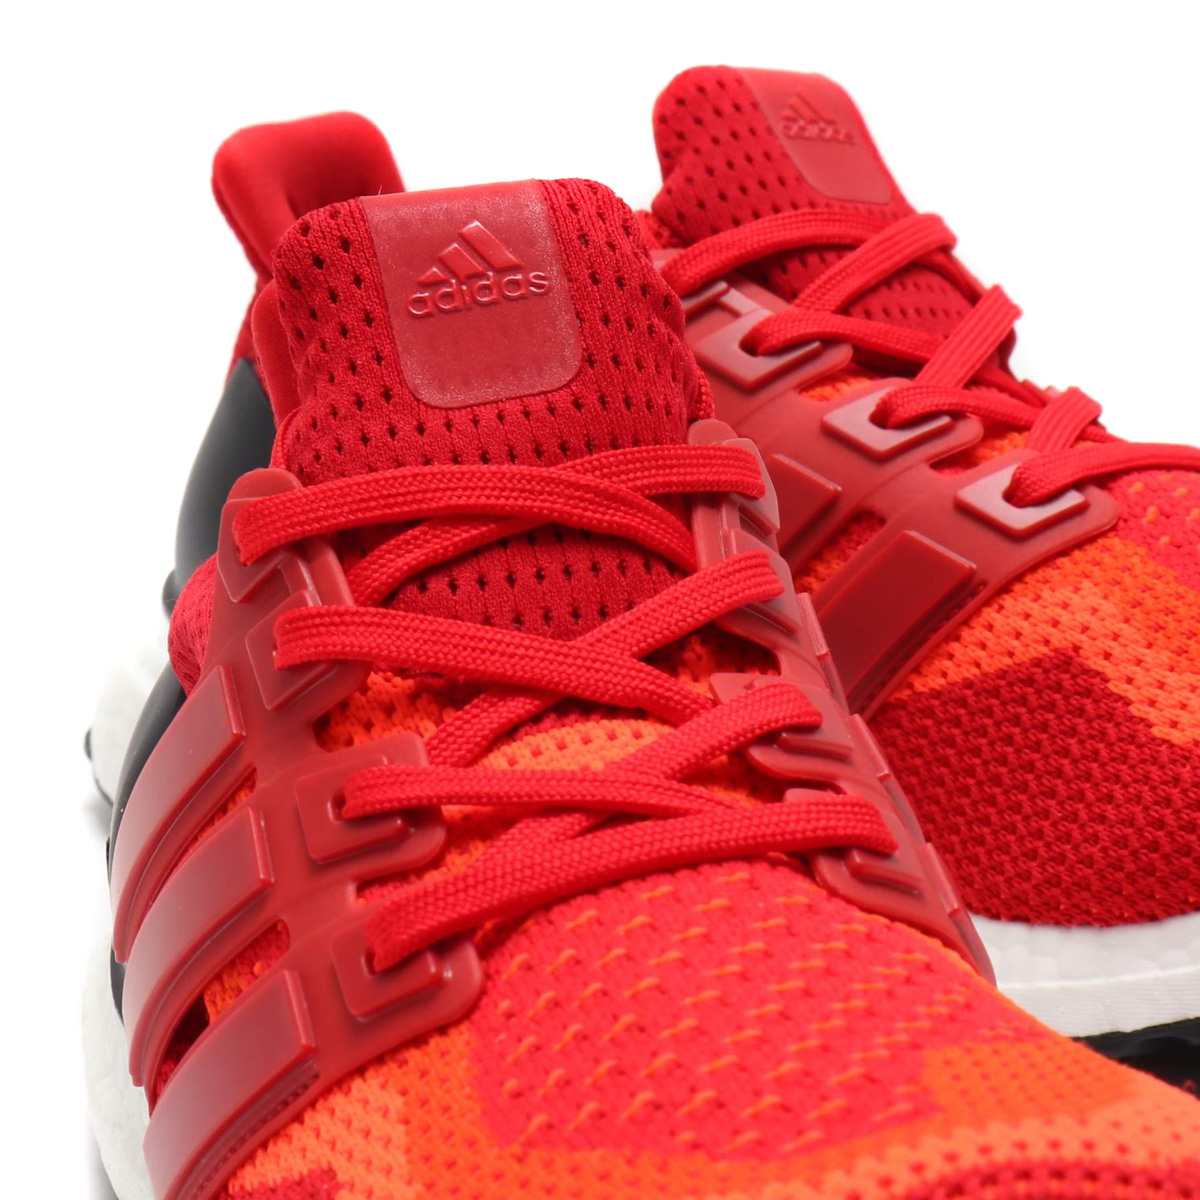 0e2b7b2d4fd1d ... good adidas ultraboost adidas ultra boost solar red power red core black  18fw i e6b73 16587